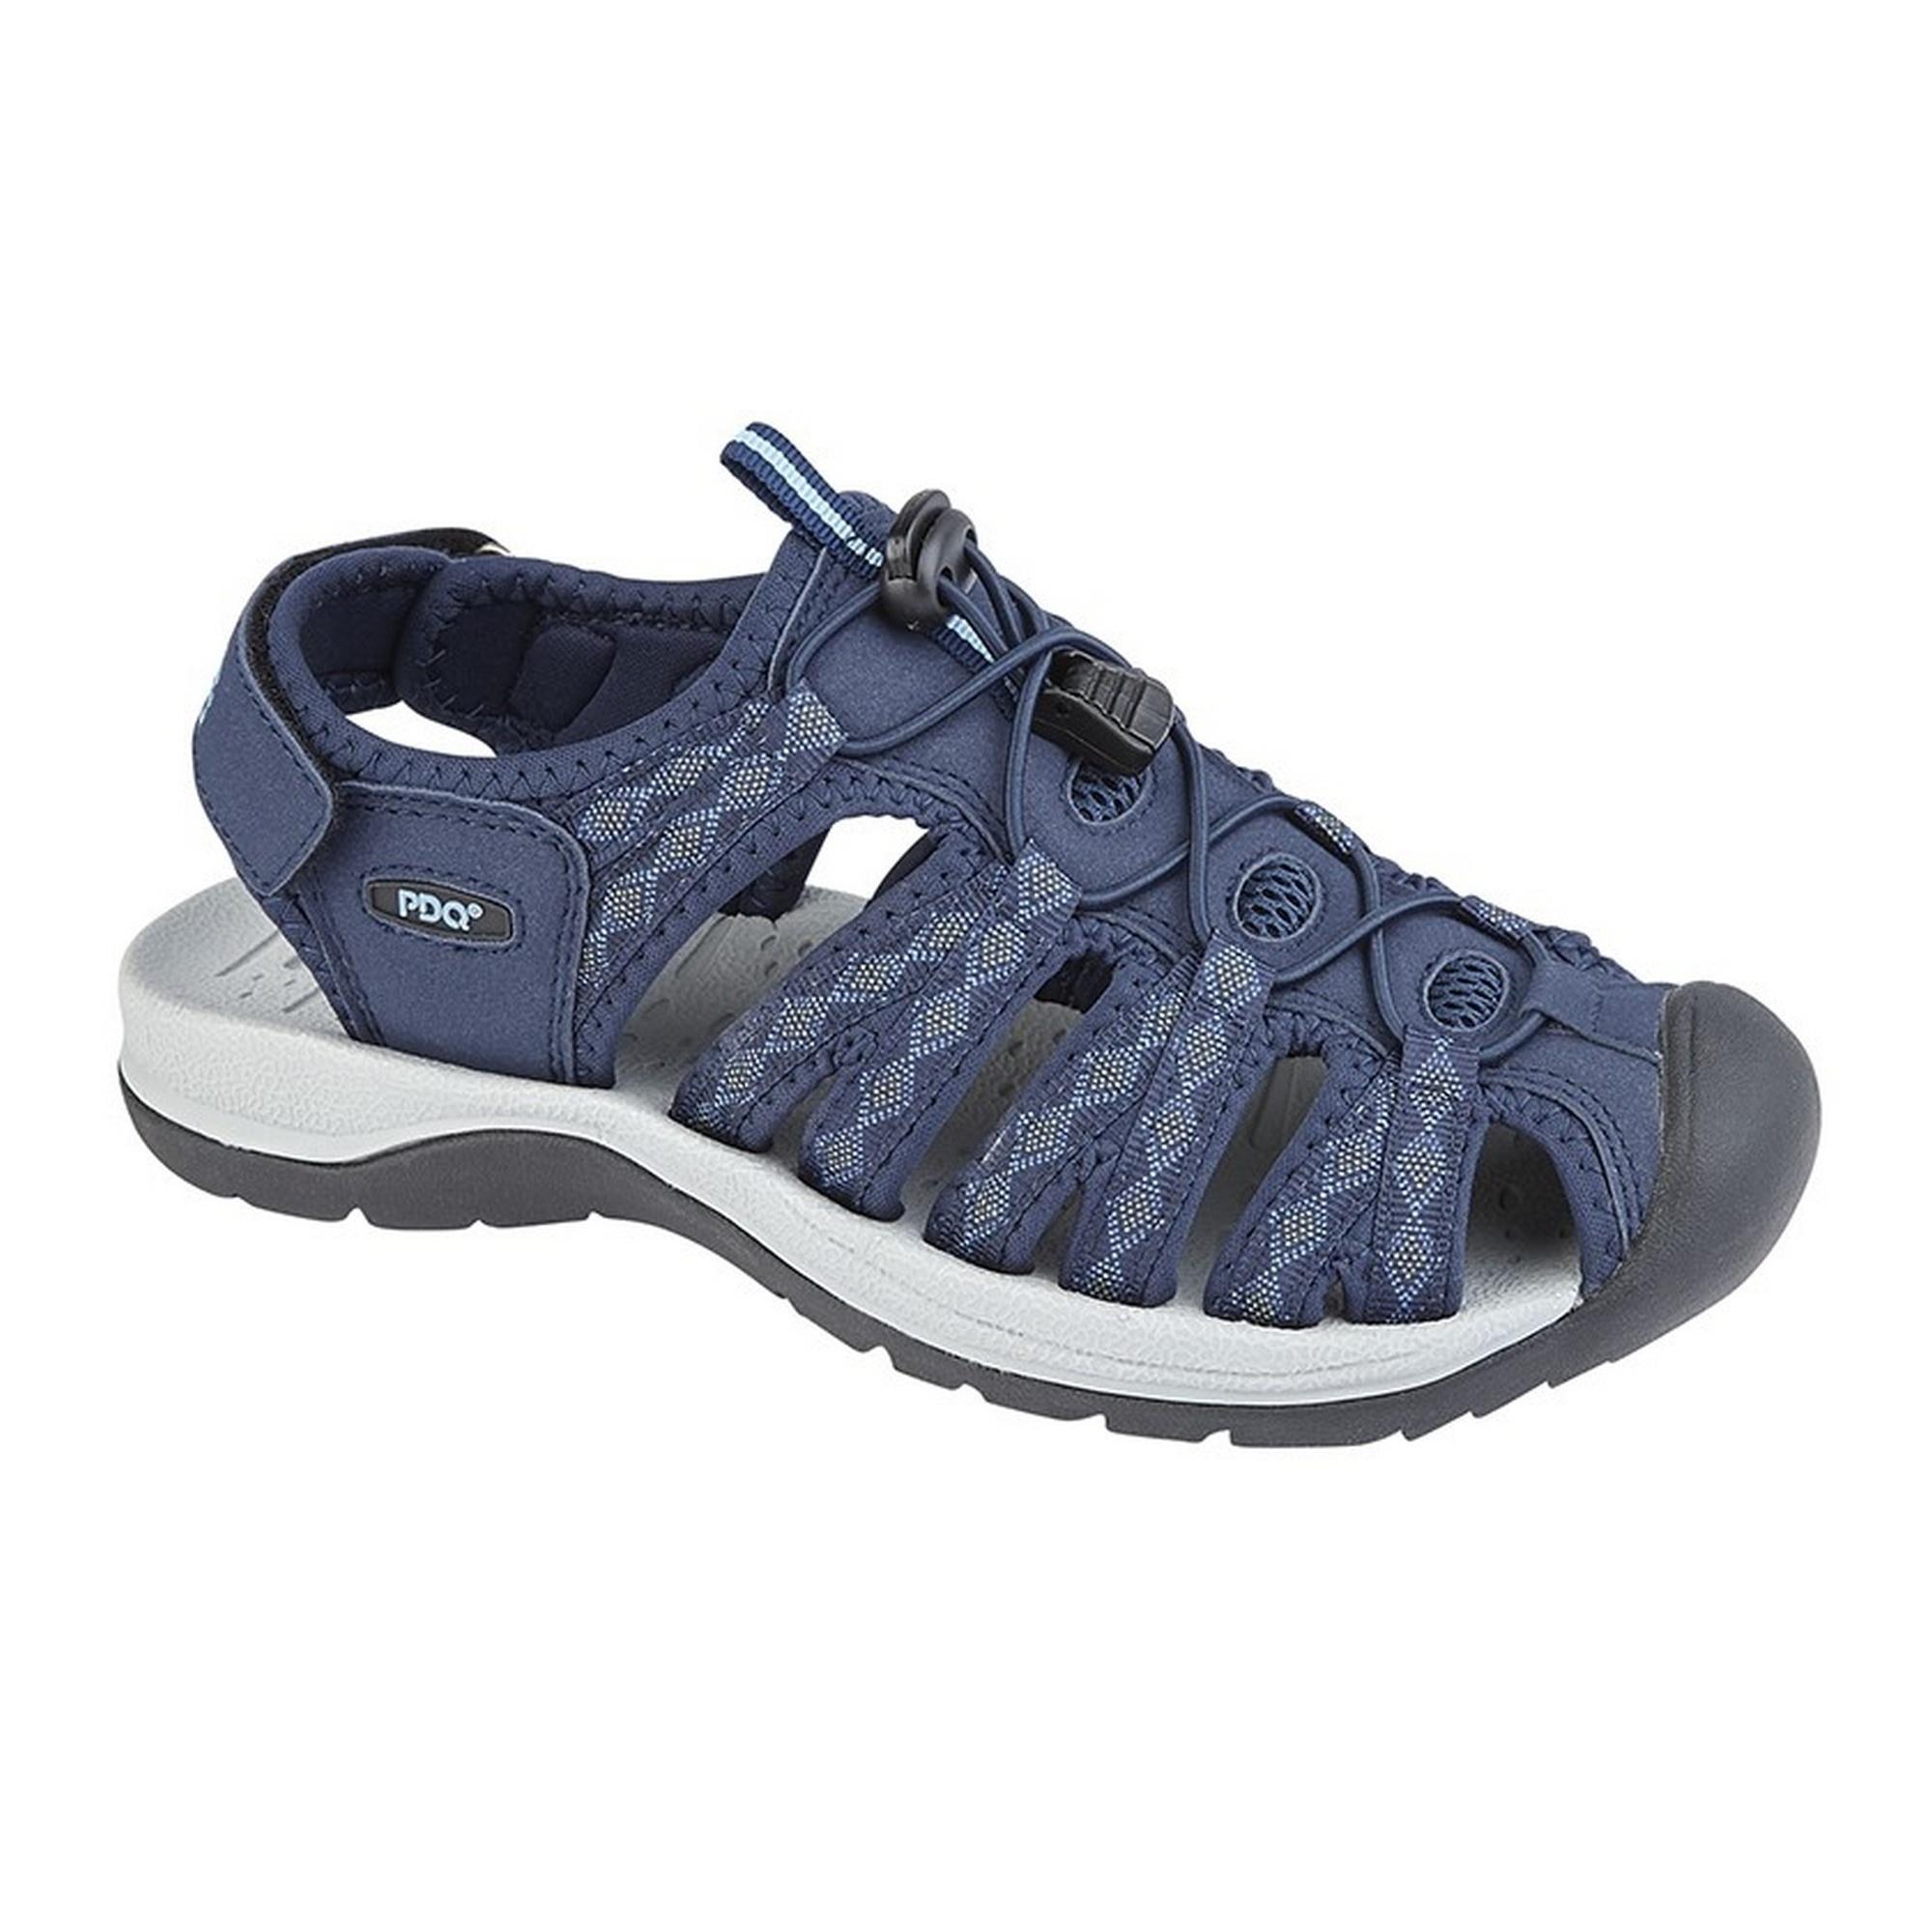 PDQ-Womens-Ladies-Superlight-Floral-Print-Sports-Sandals